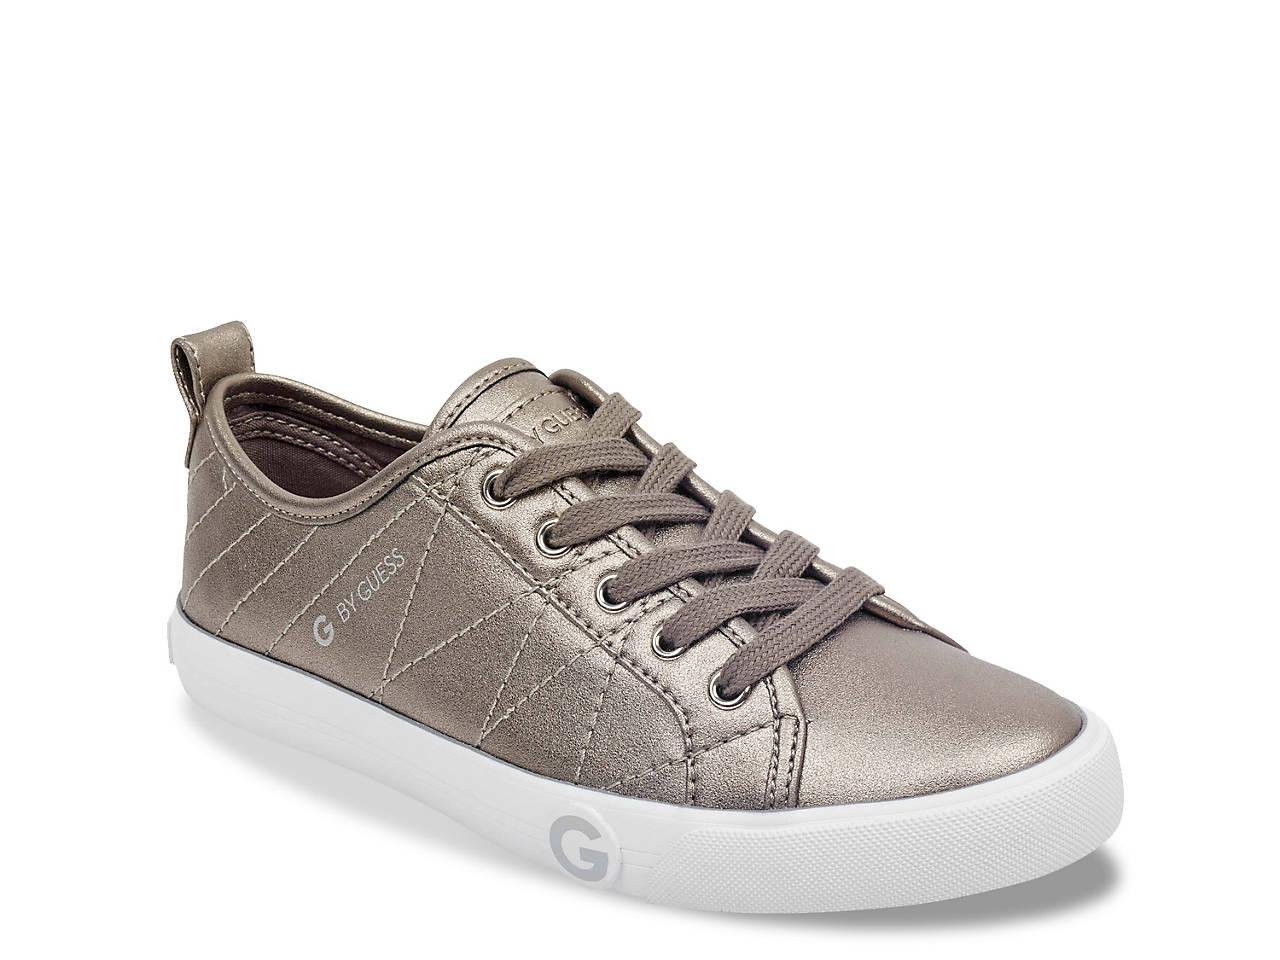 12032b51f961 G by GUESS Orfin Sneaker Women s Shoes